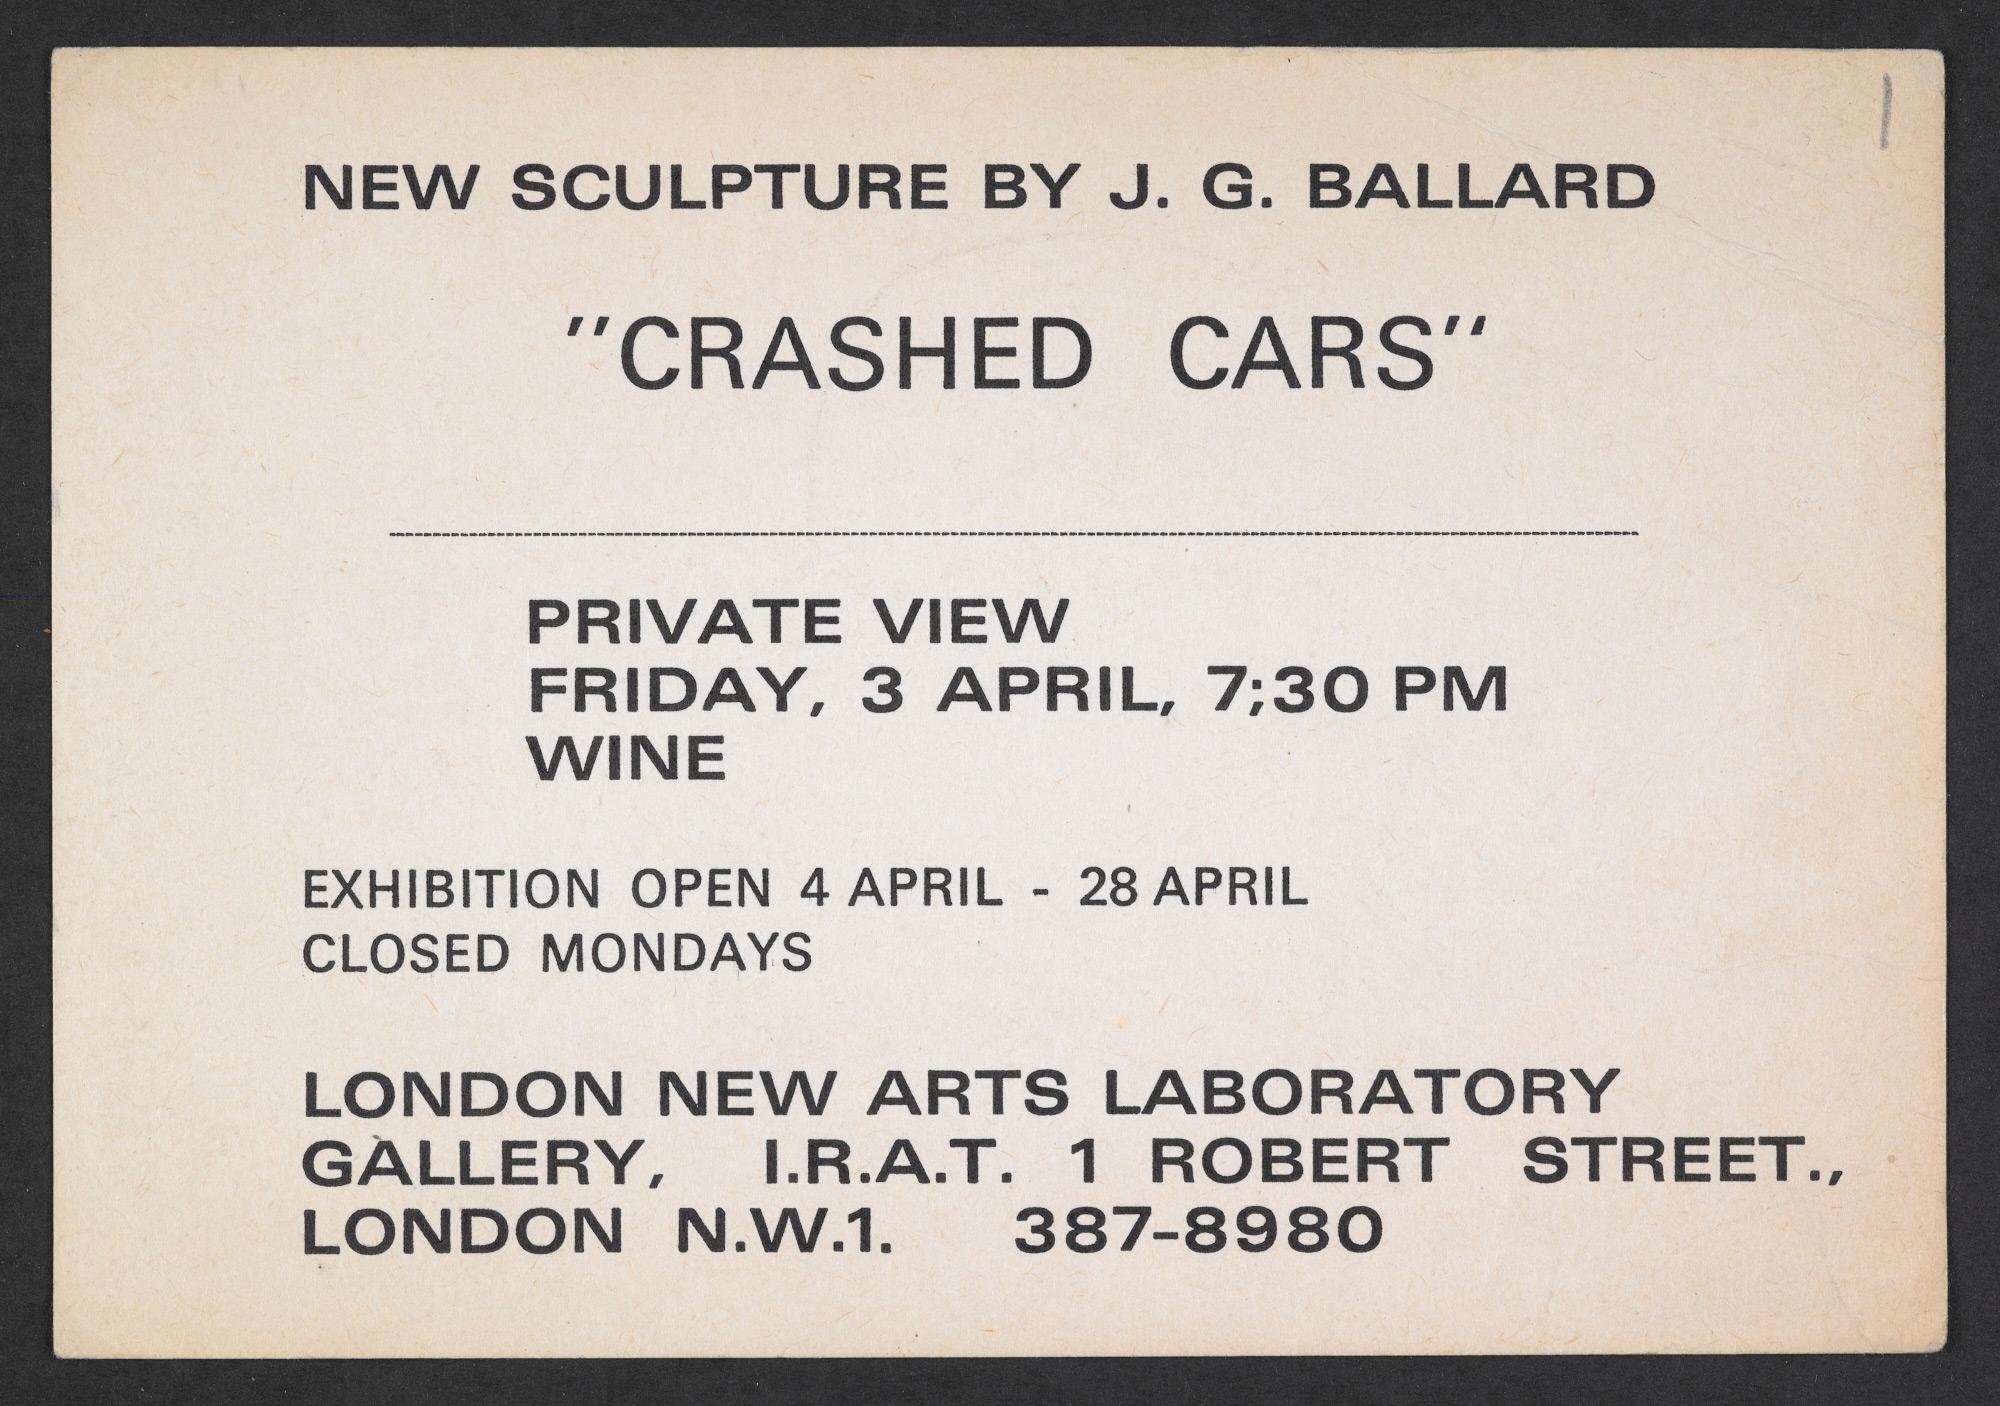 Invitation card to J G Ballard's 'Crashed Cars' exhibition, 3 April 1970